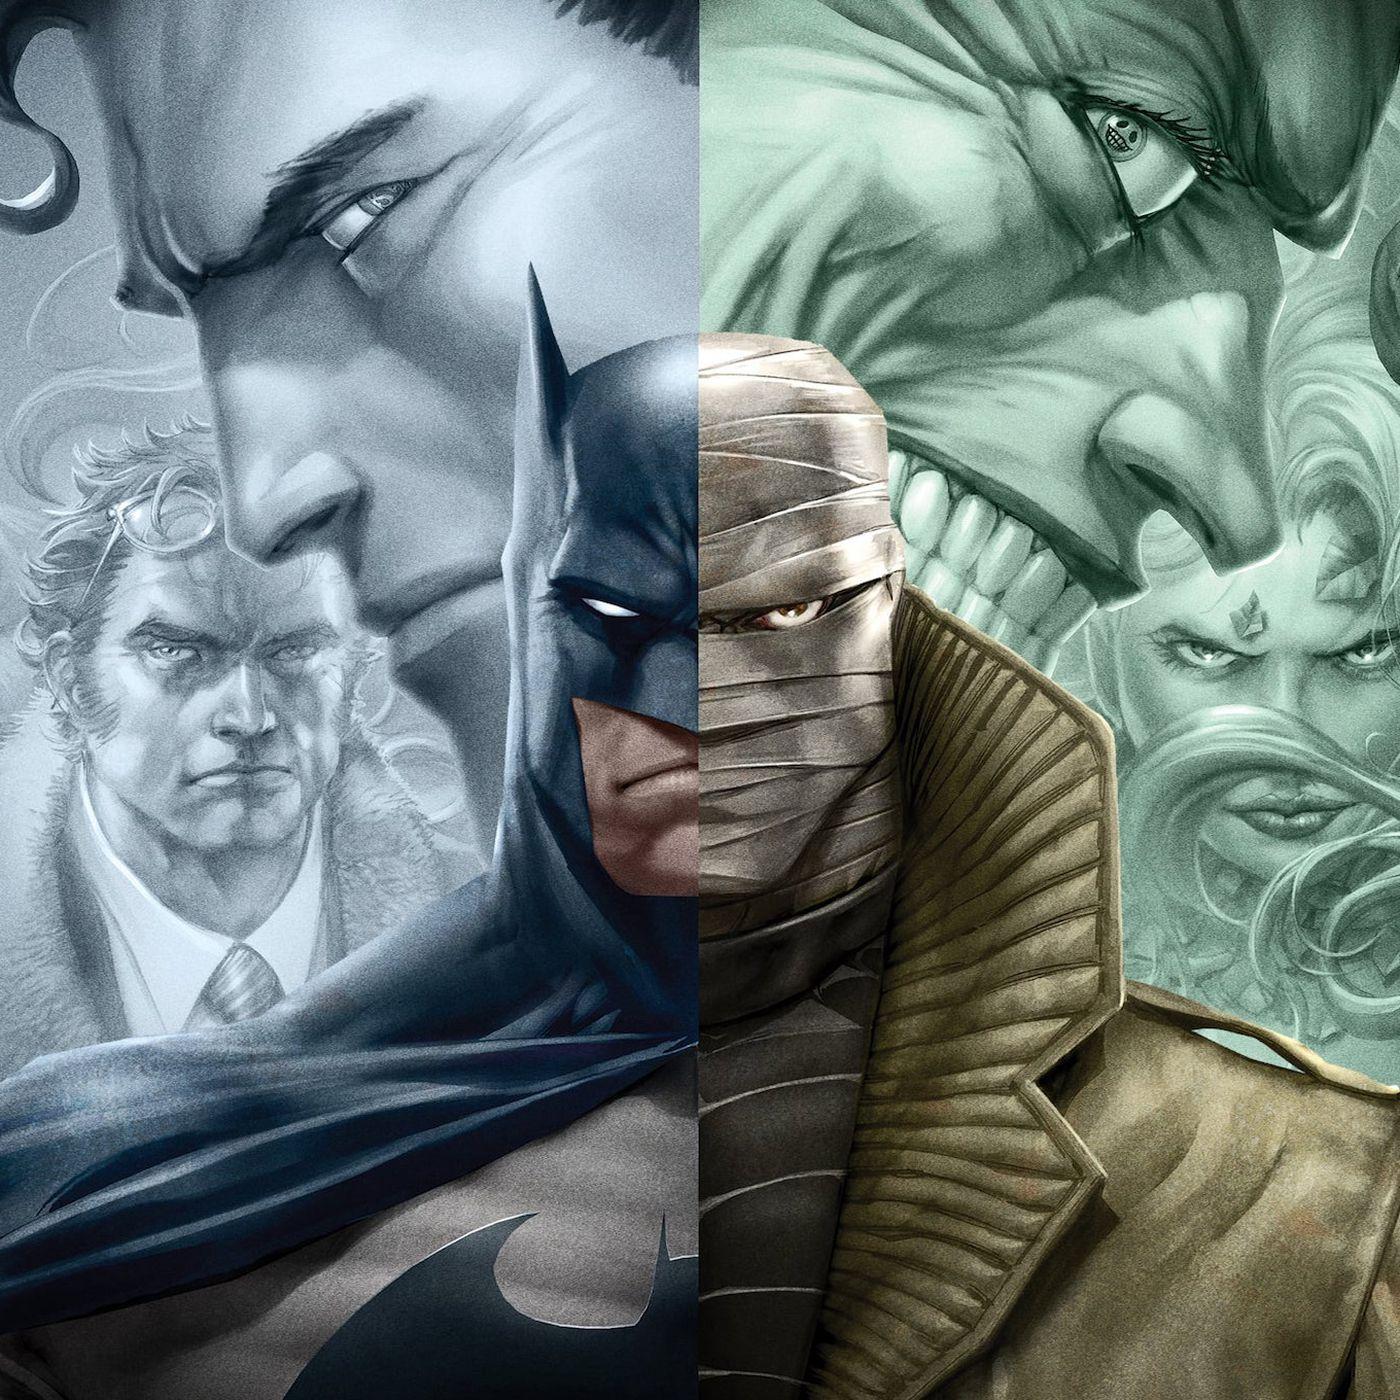 Batman Hush Expands The Dc Comics Animated Movie Universe We Deserve Polygon